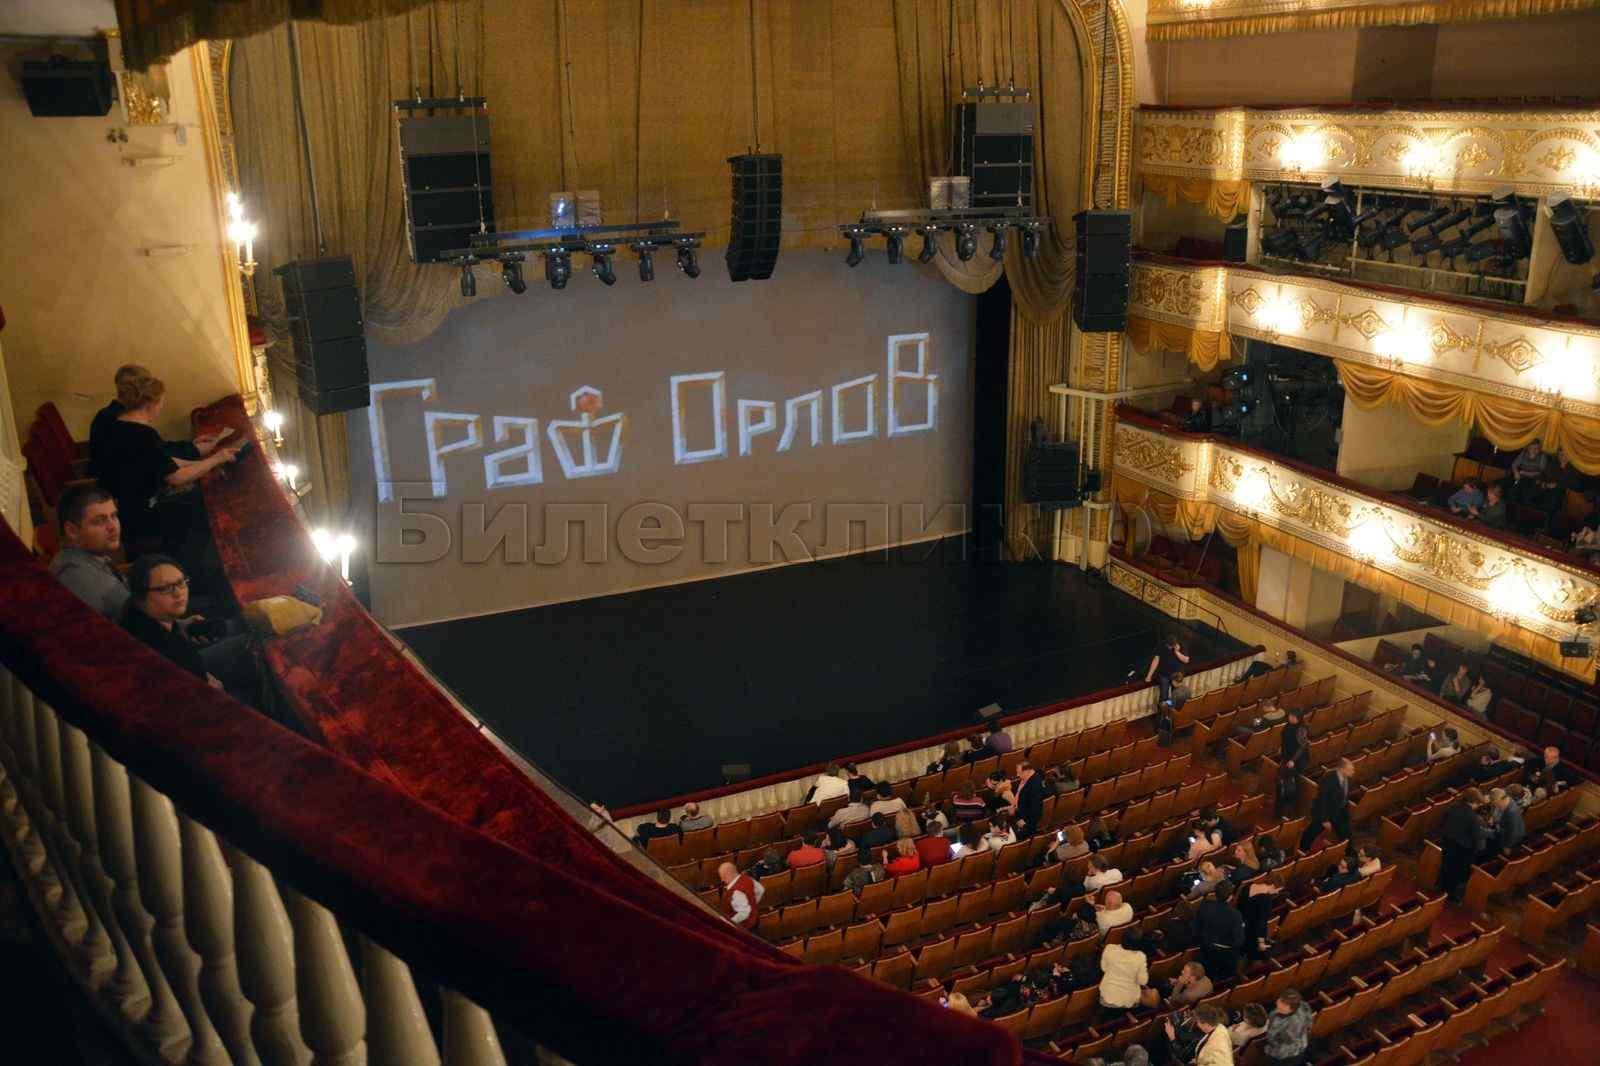 концерт киркорова в оренбурге цена билета